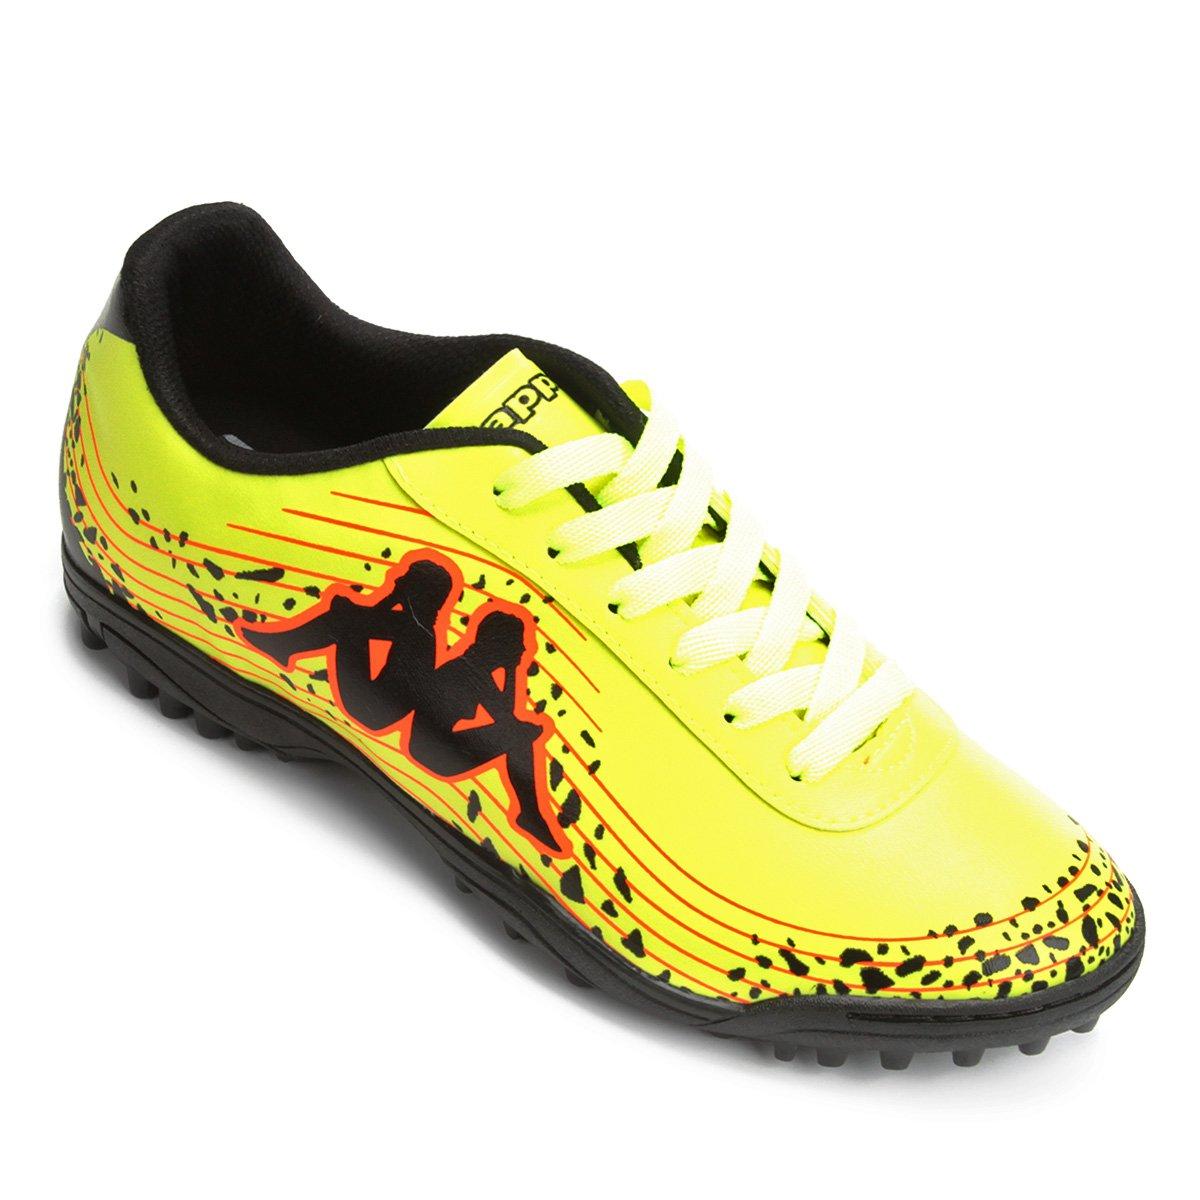 968cd0c0f2 Chuteira Society Kappa Lightning - Verde e laranja - Compre Agora ...